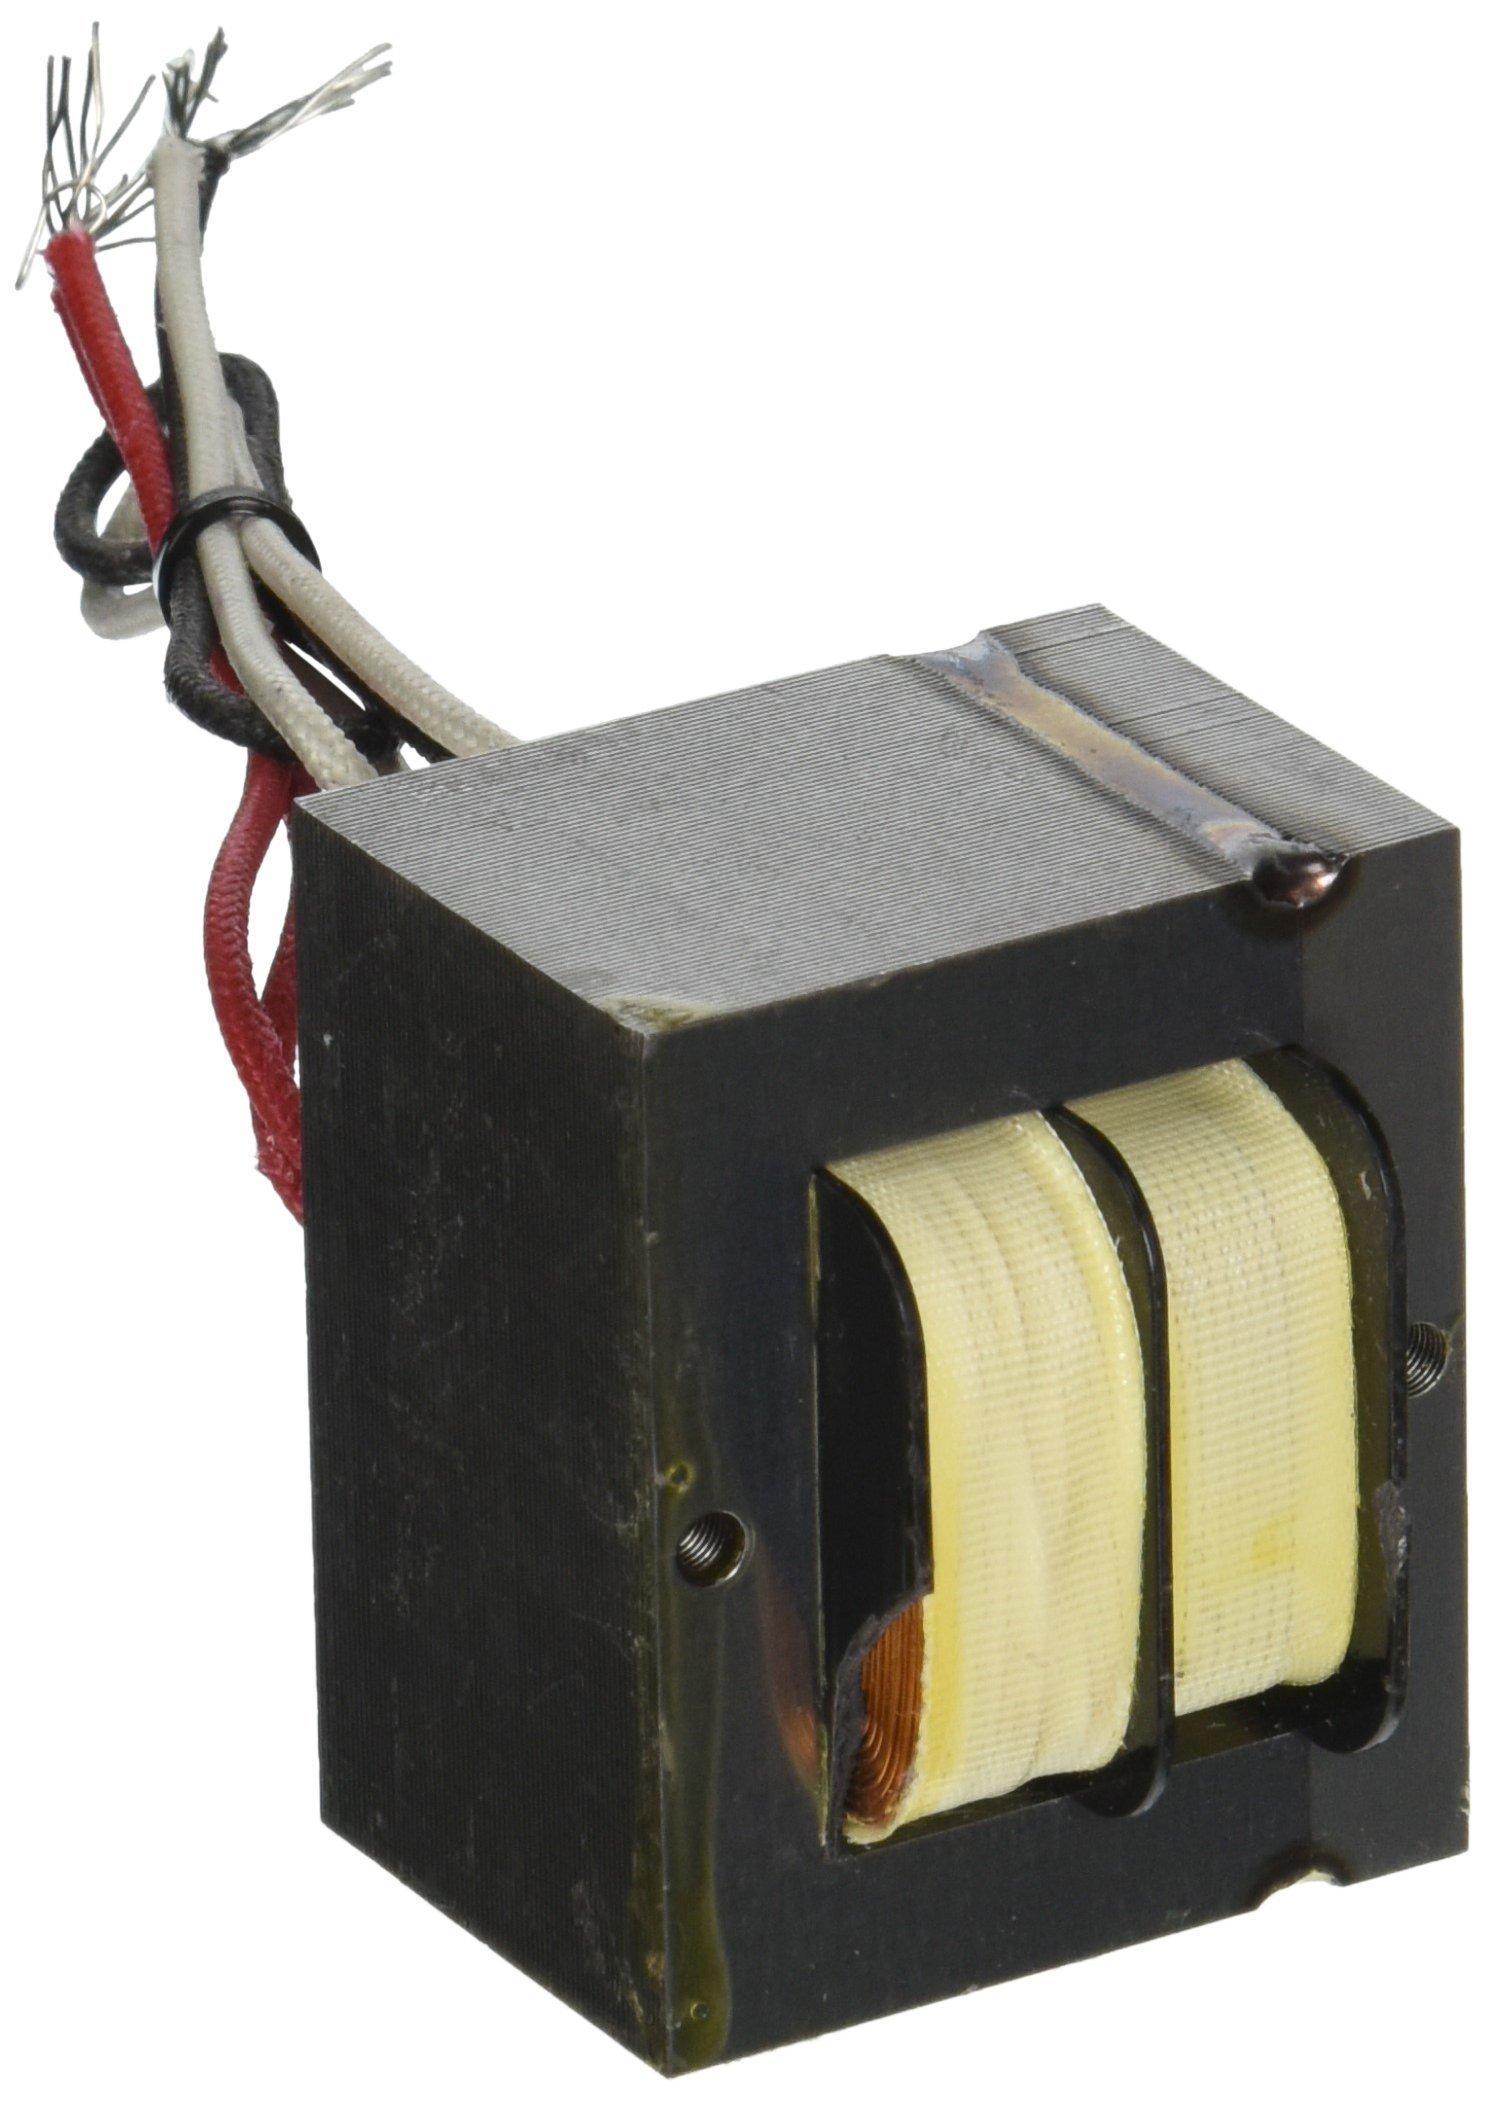 Eurofase TM04 50W Magnetic Transformer